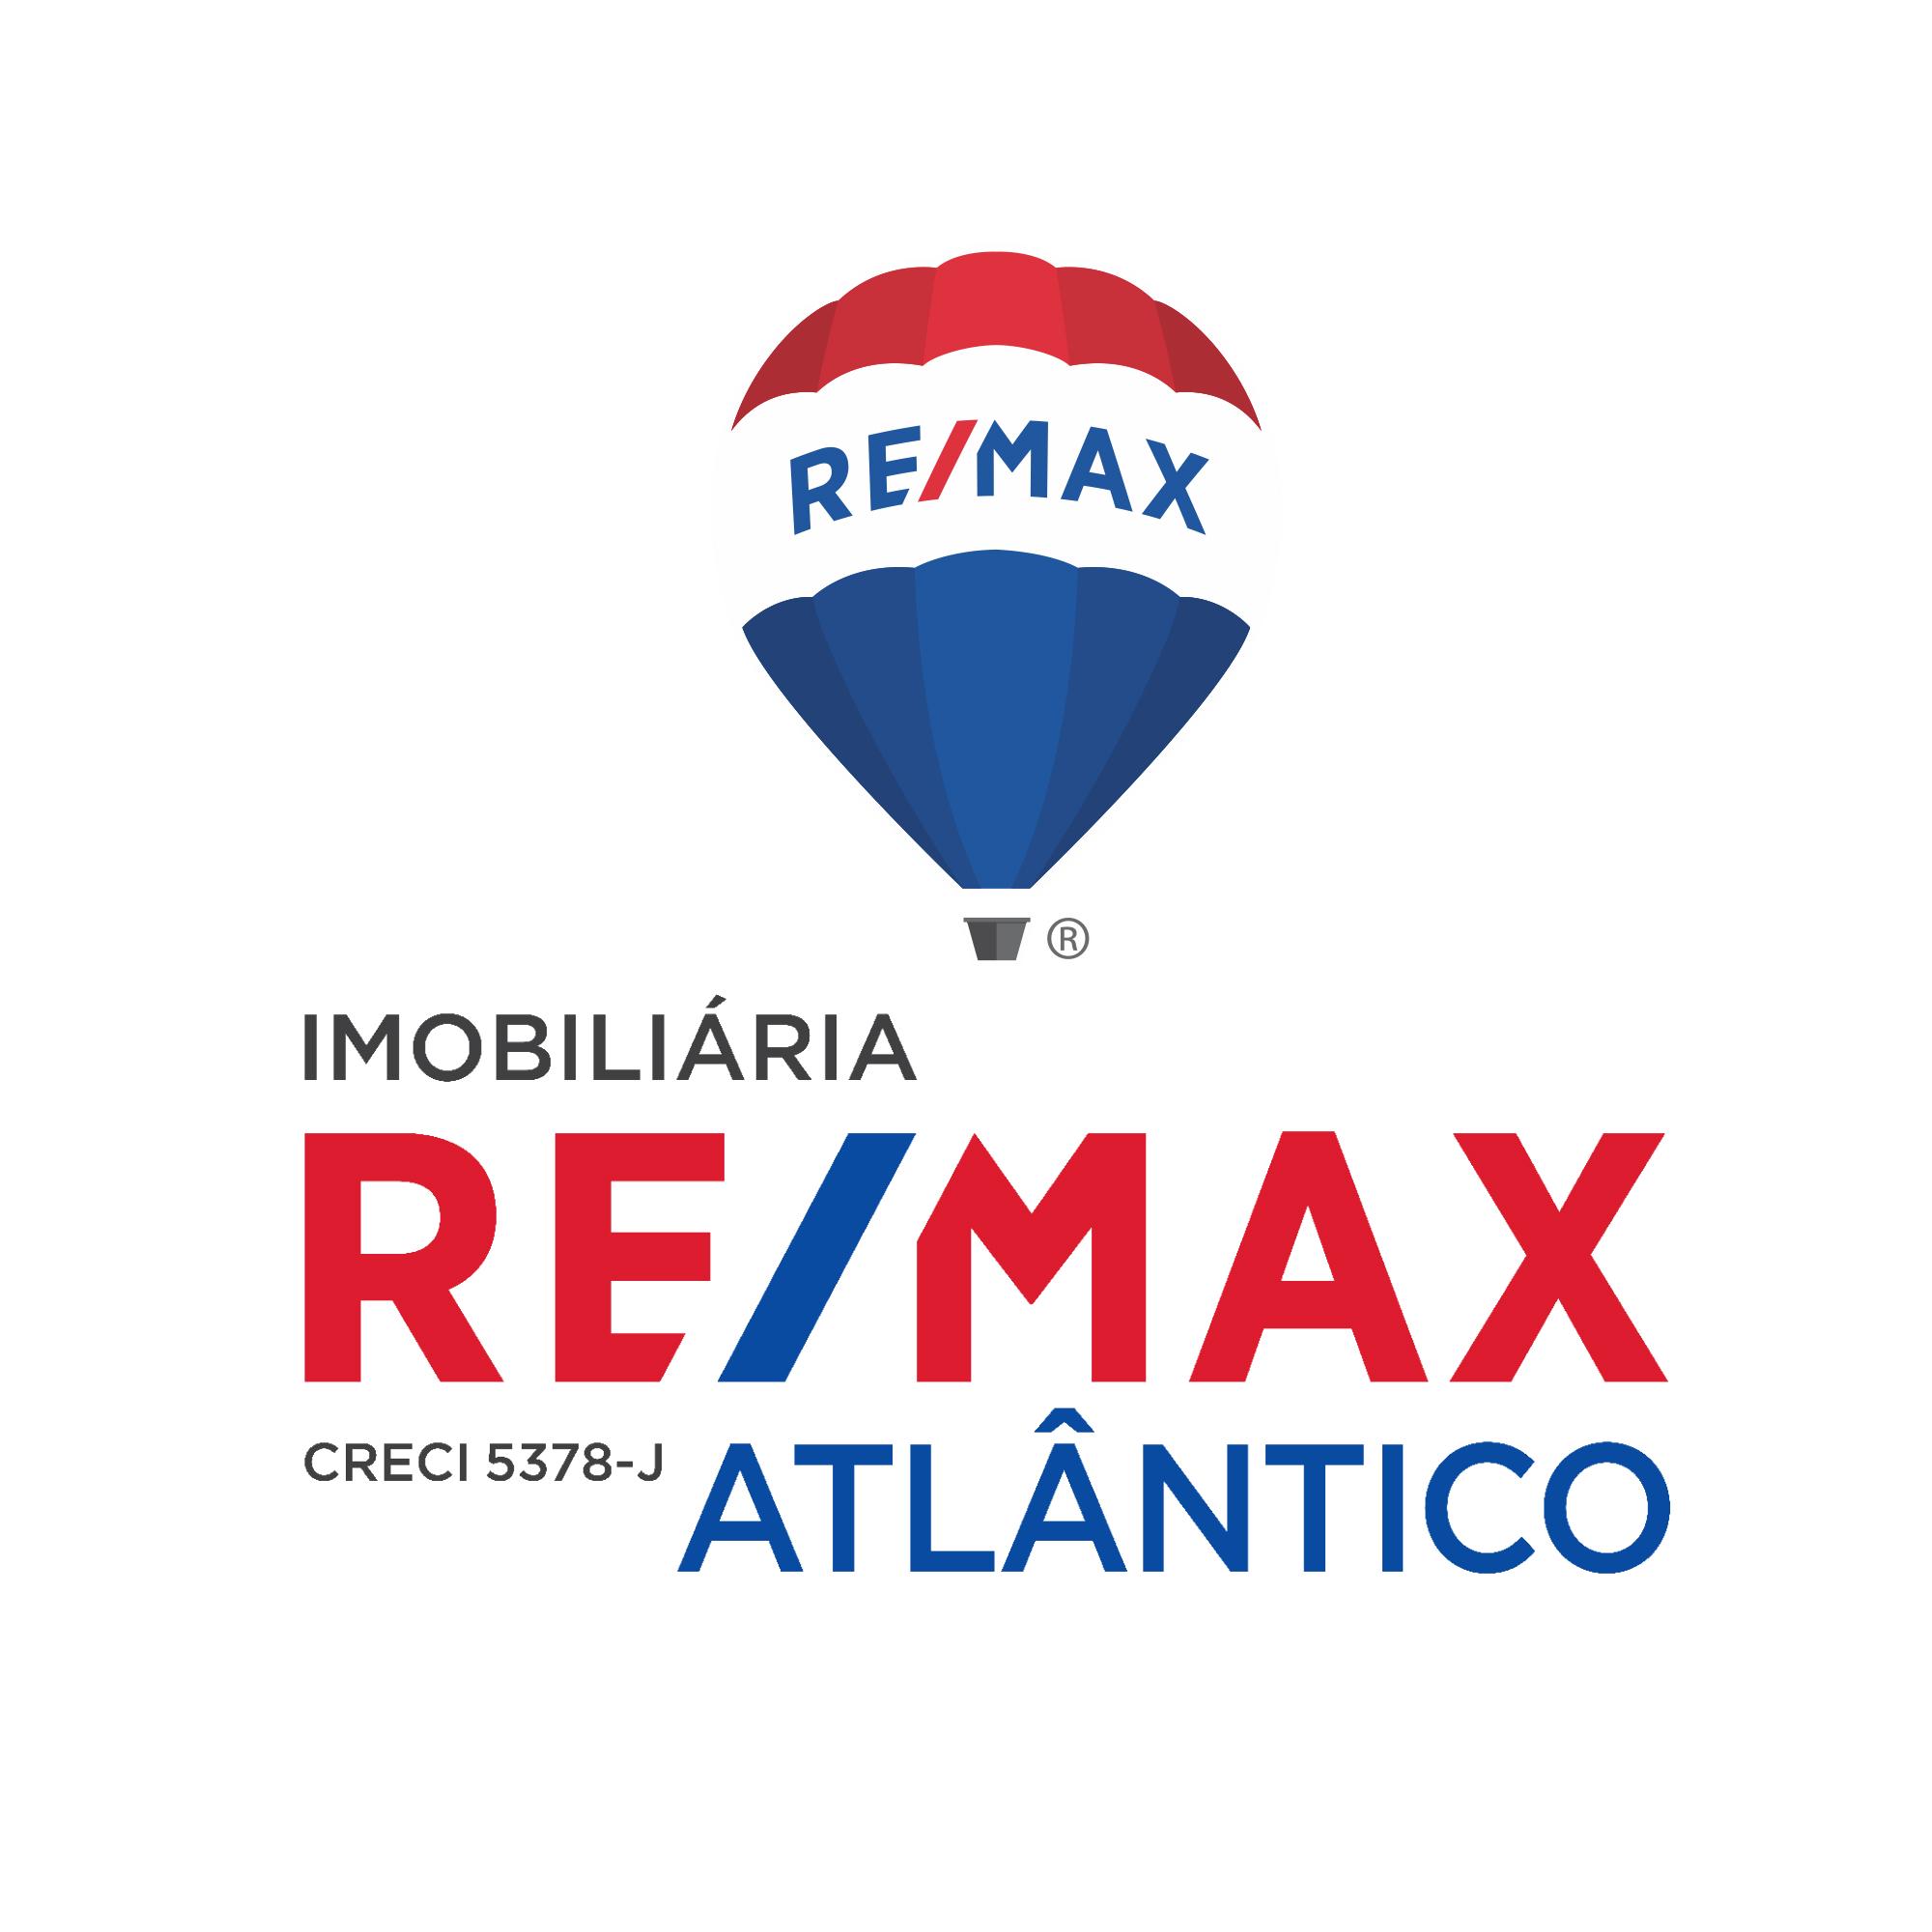 RE/MAX ATLÂNTICO